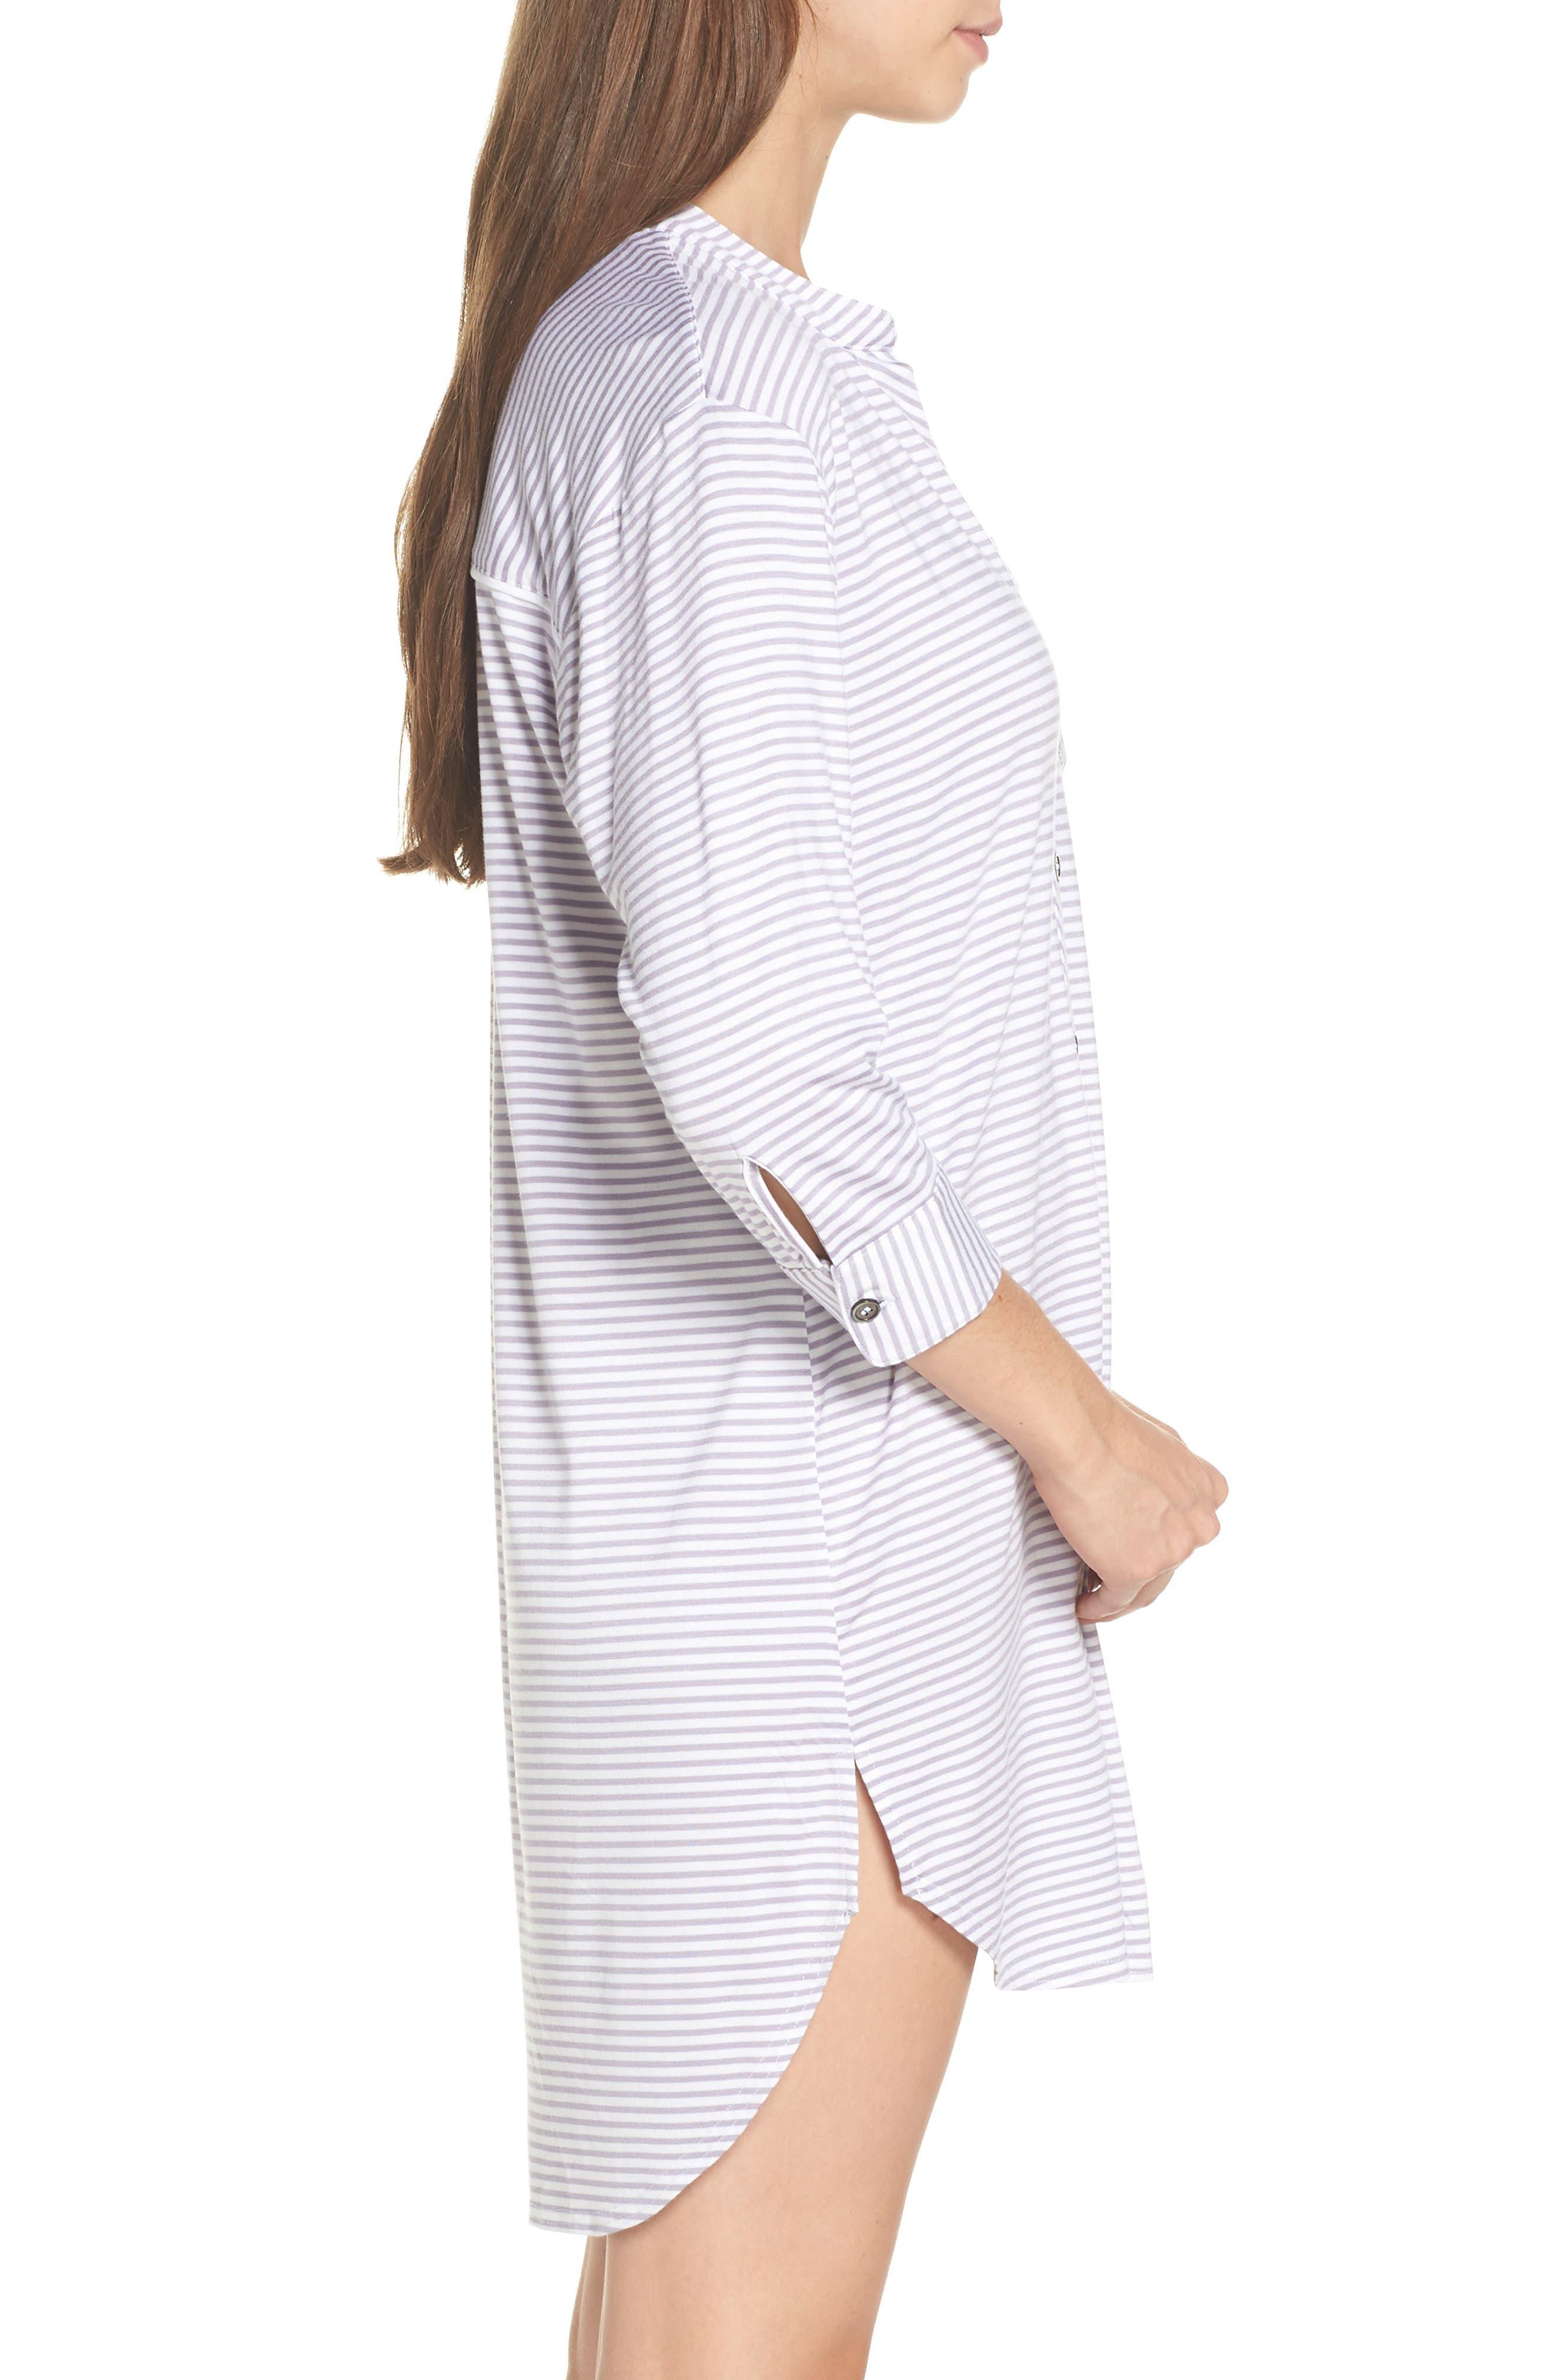 Vivian Sleep Shirt,                             Alternate thumbnail 3, color,                             LAVENDER AURA / WHITE STRIPE